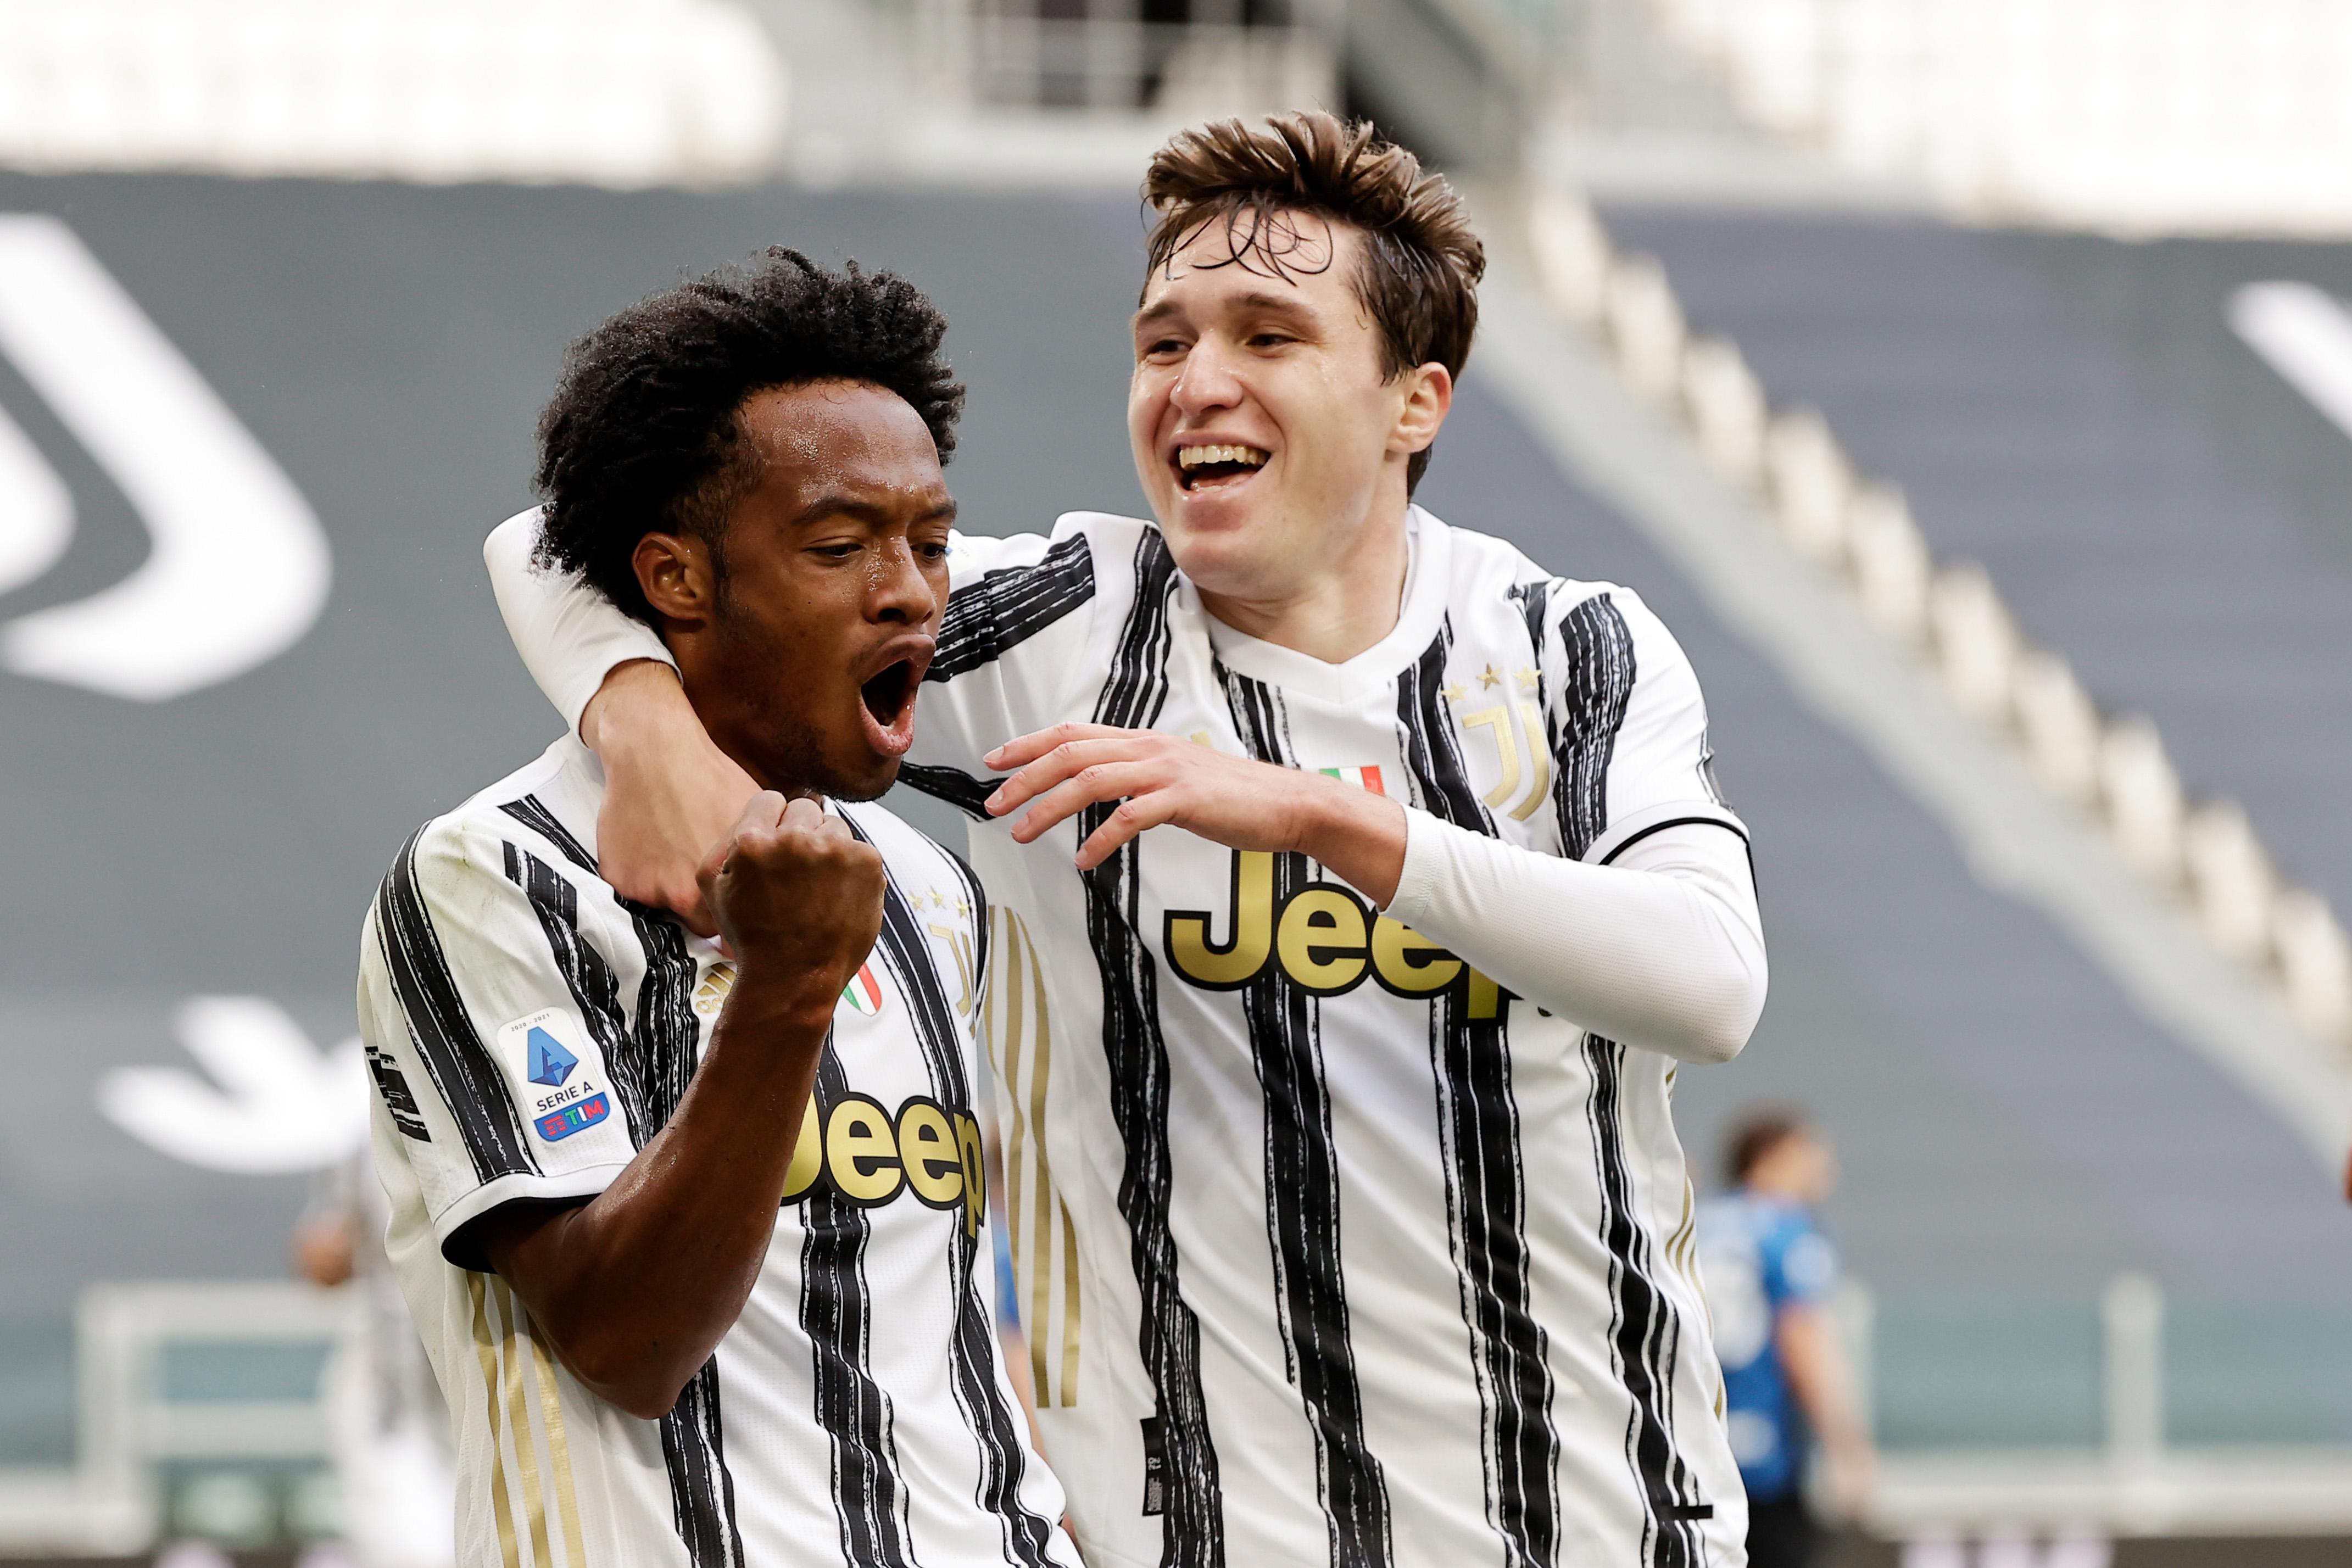 Juventus v Internazionale - Italian Serie A